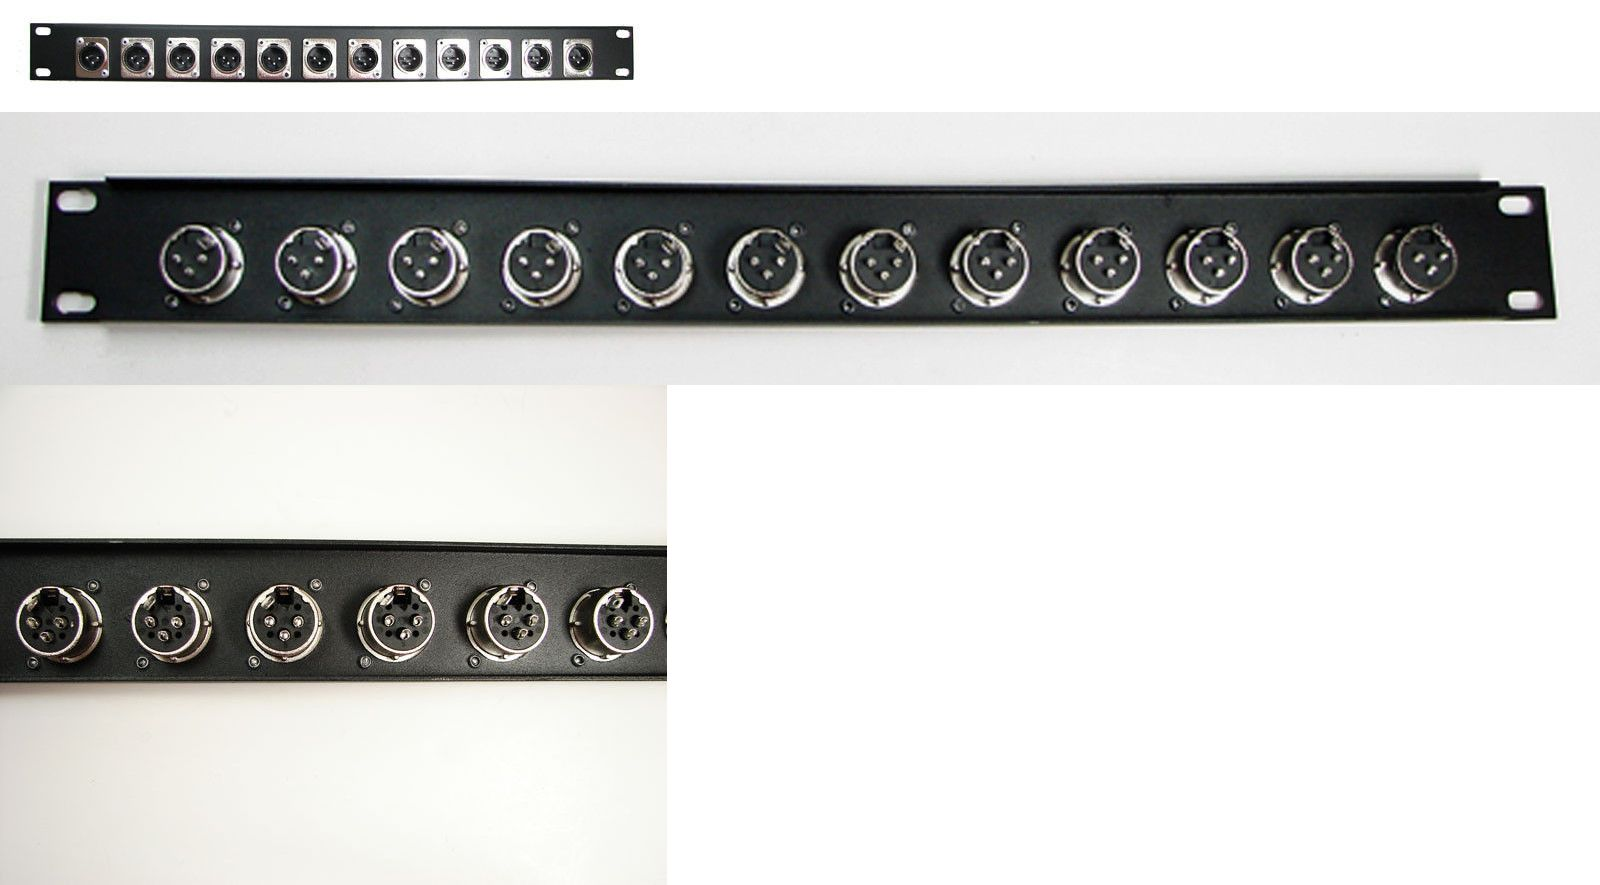 Black Pre-Punched for 12 XLRs 1U Procraft 16 ga Formed Aluminum Rack Panel